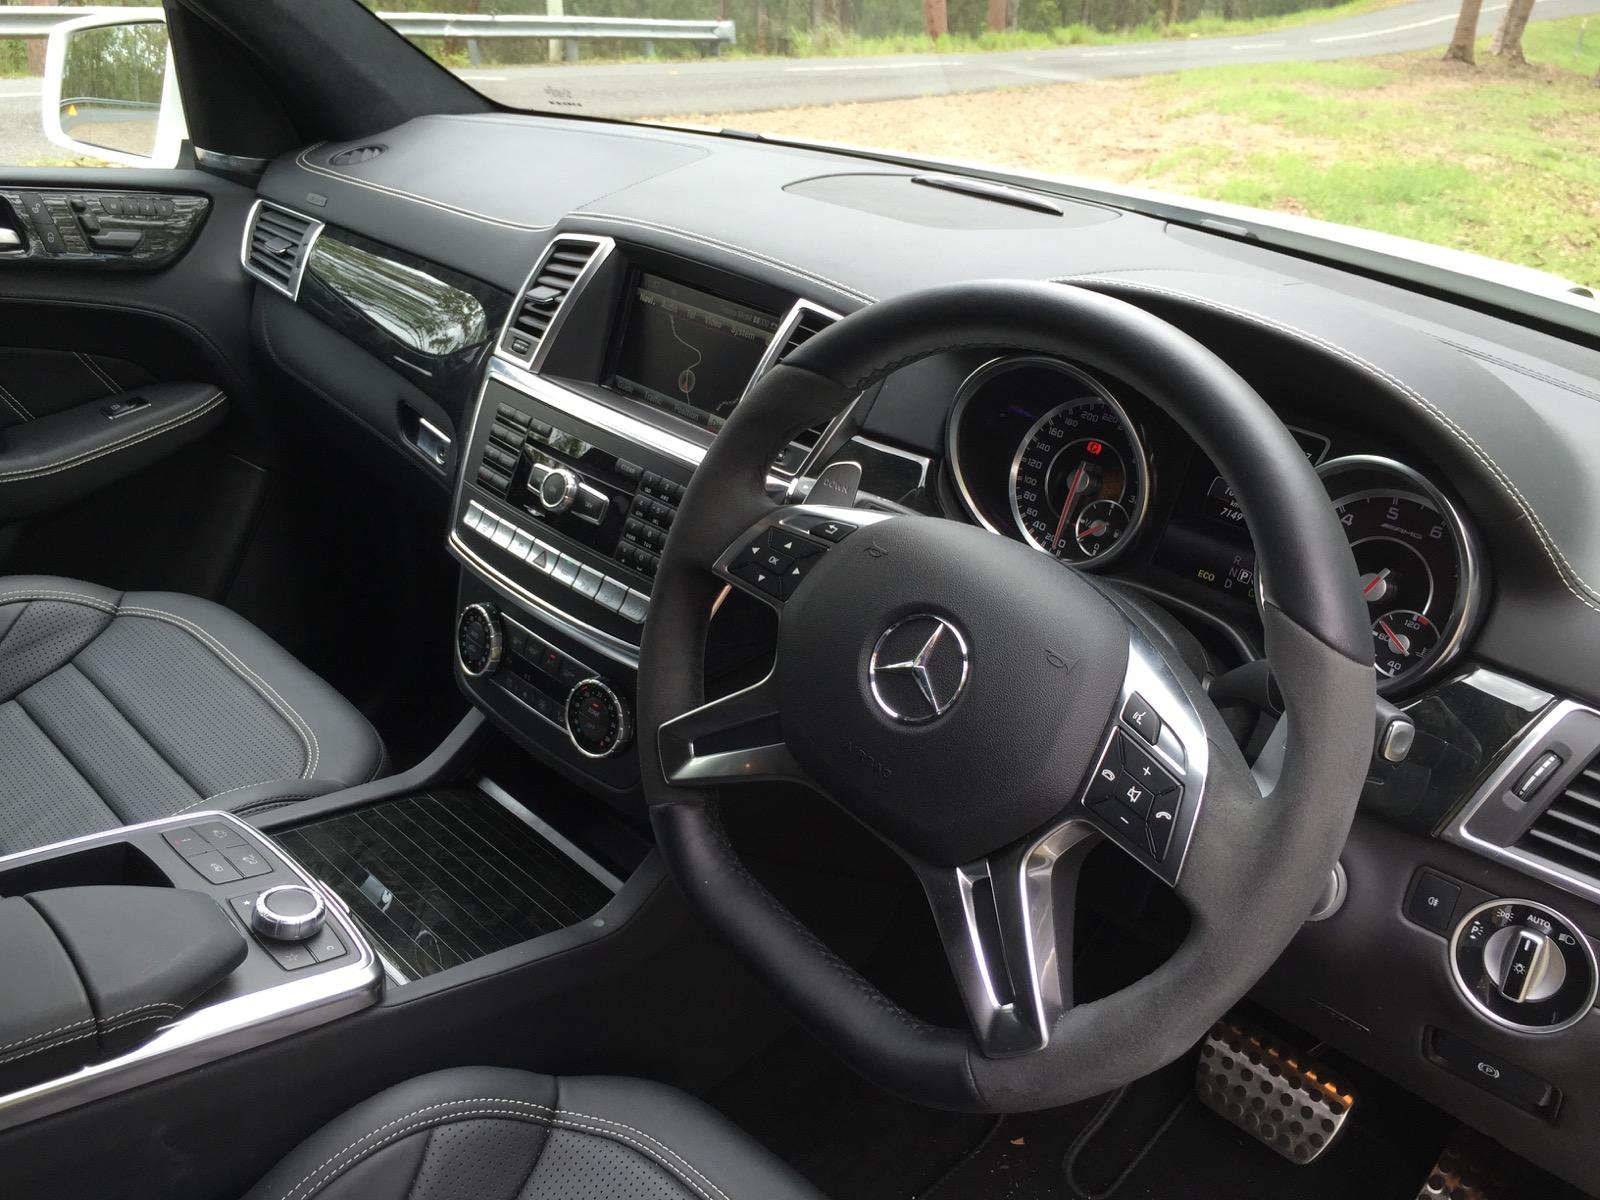 2015 Mercedes Benz Ml63 Amg Review Photos Caradvice